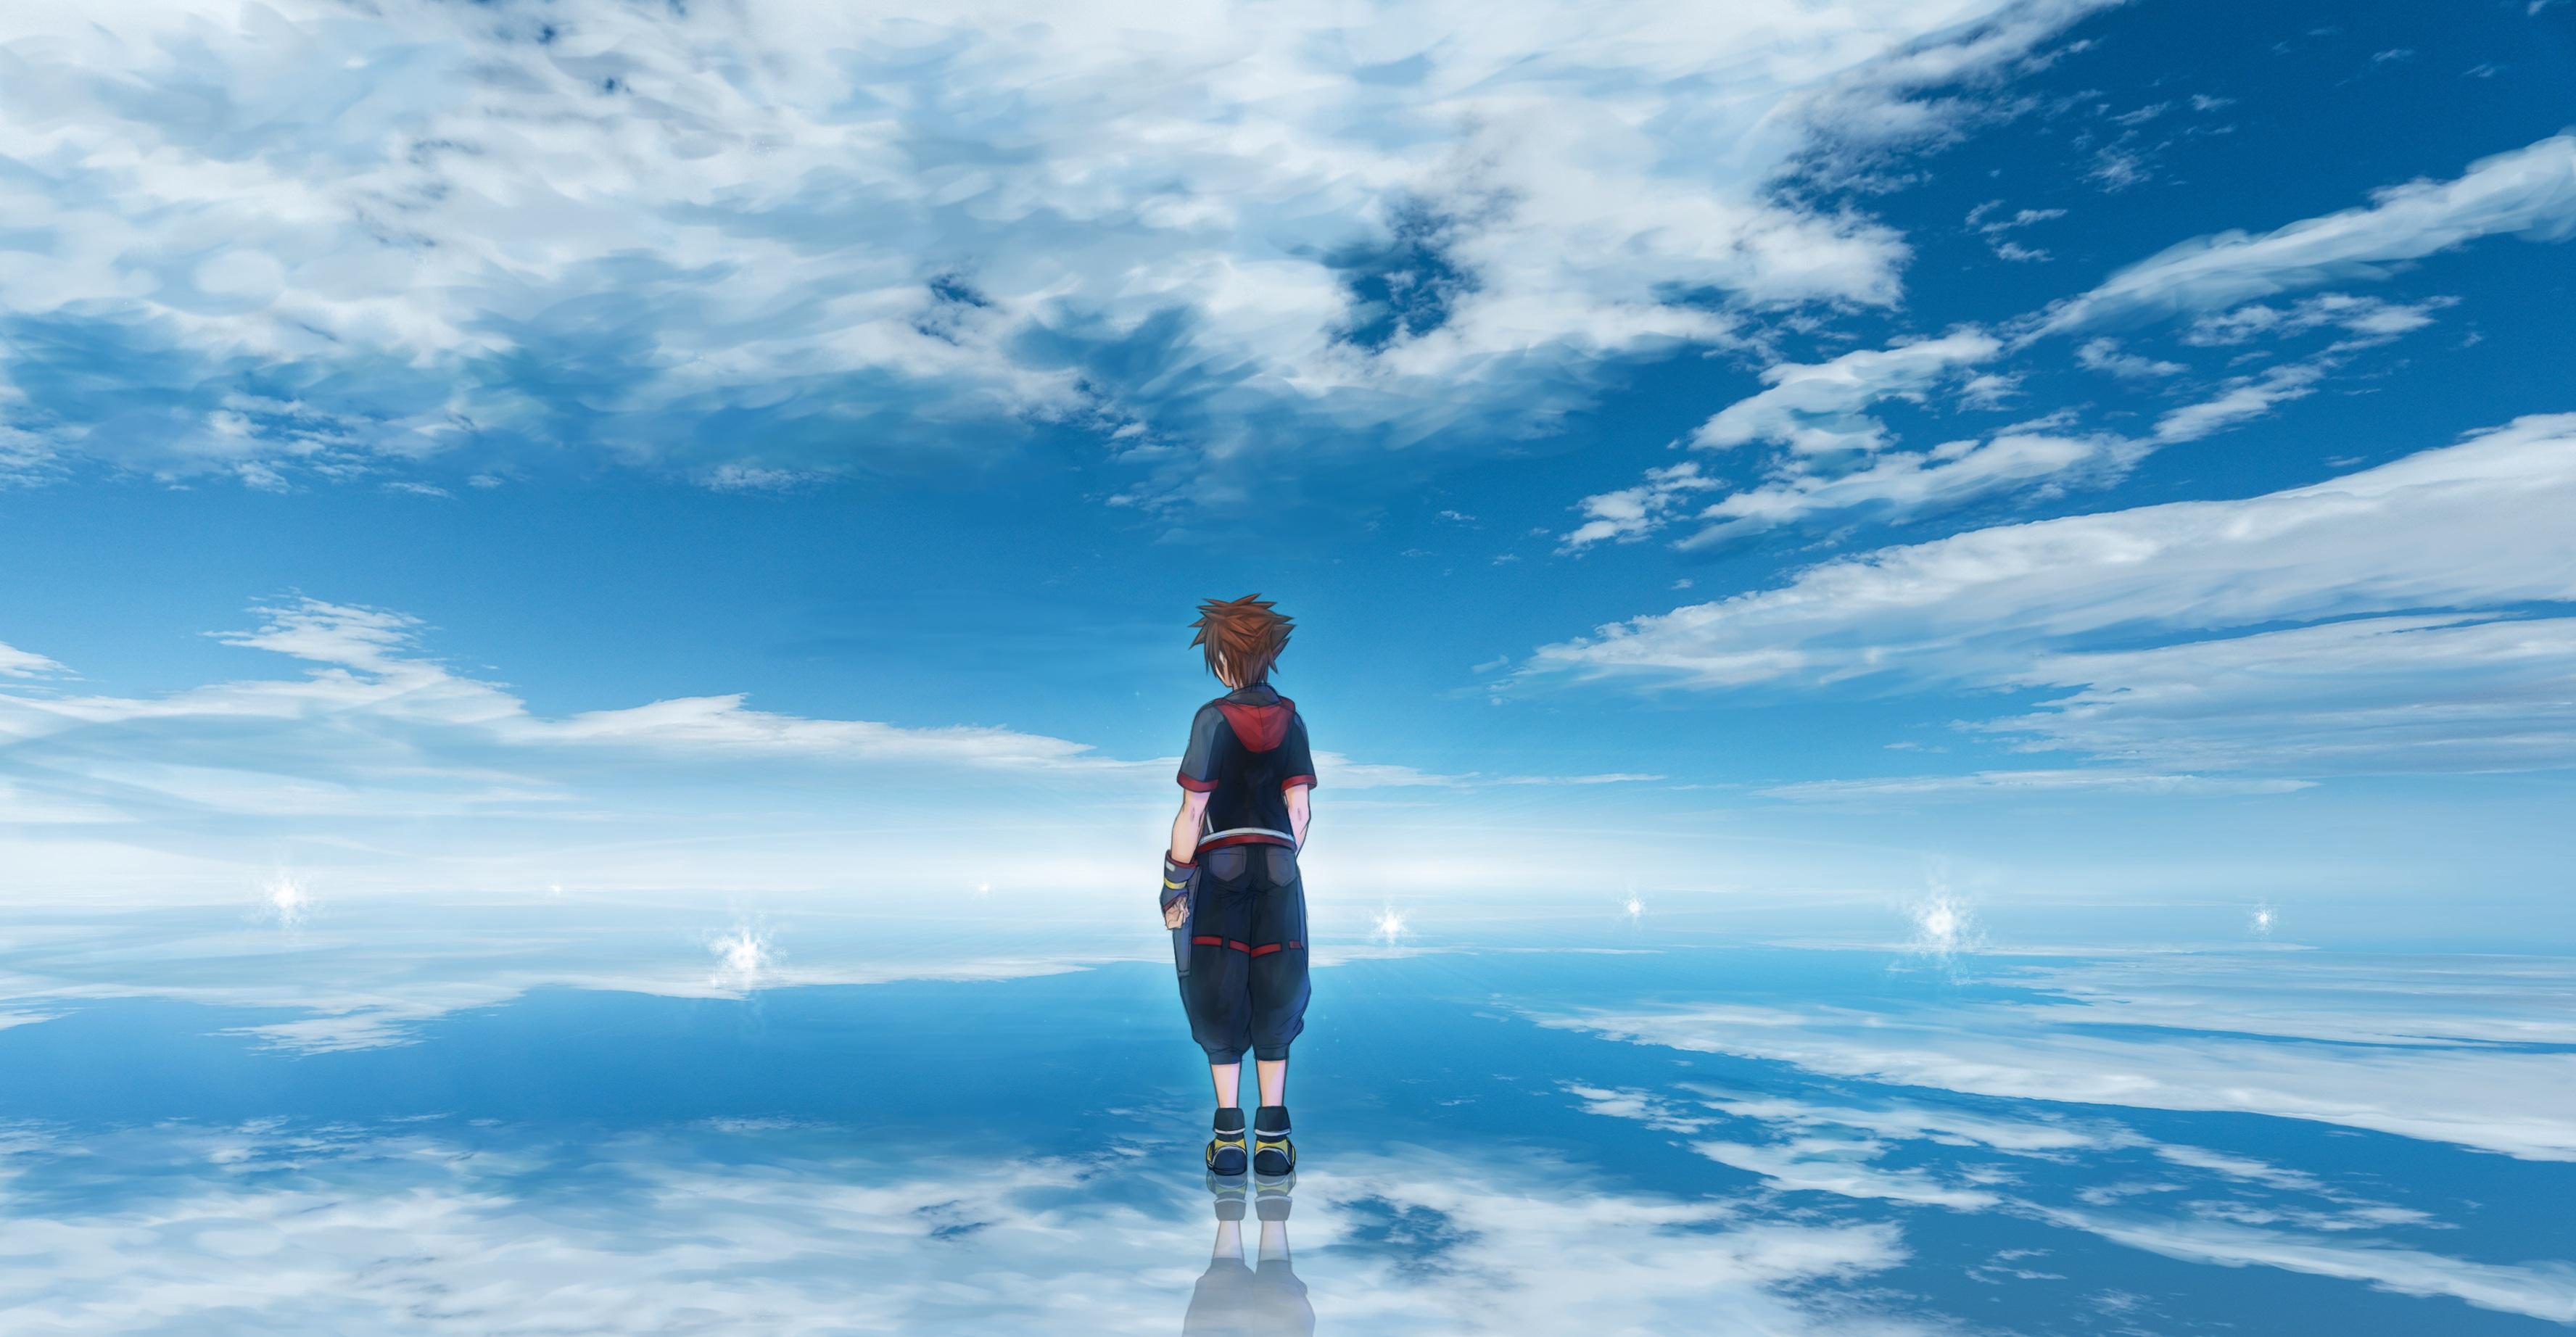 Kingdom Hearts Iii Fondo De Pantalla Hd Fondo De